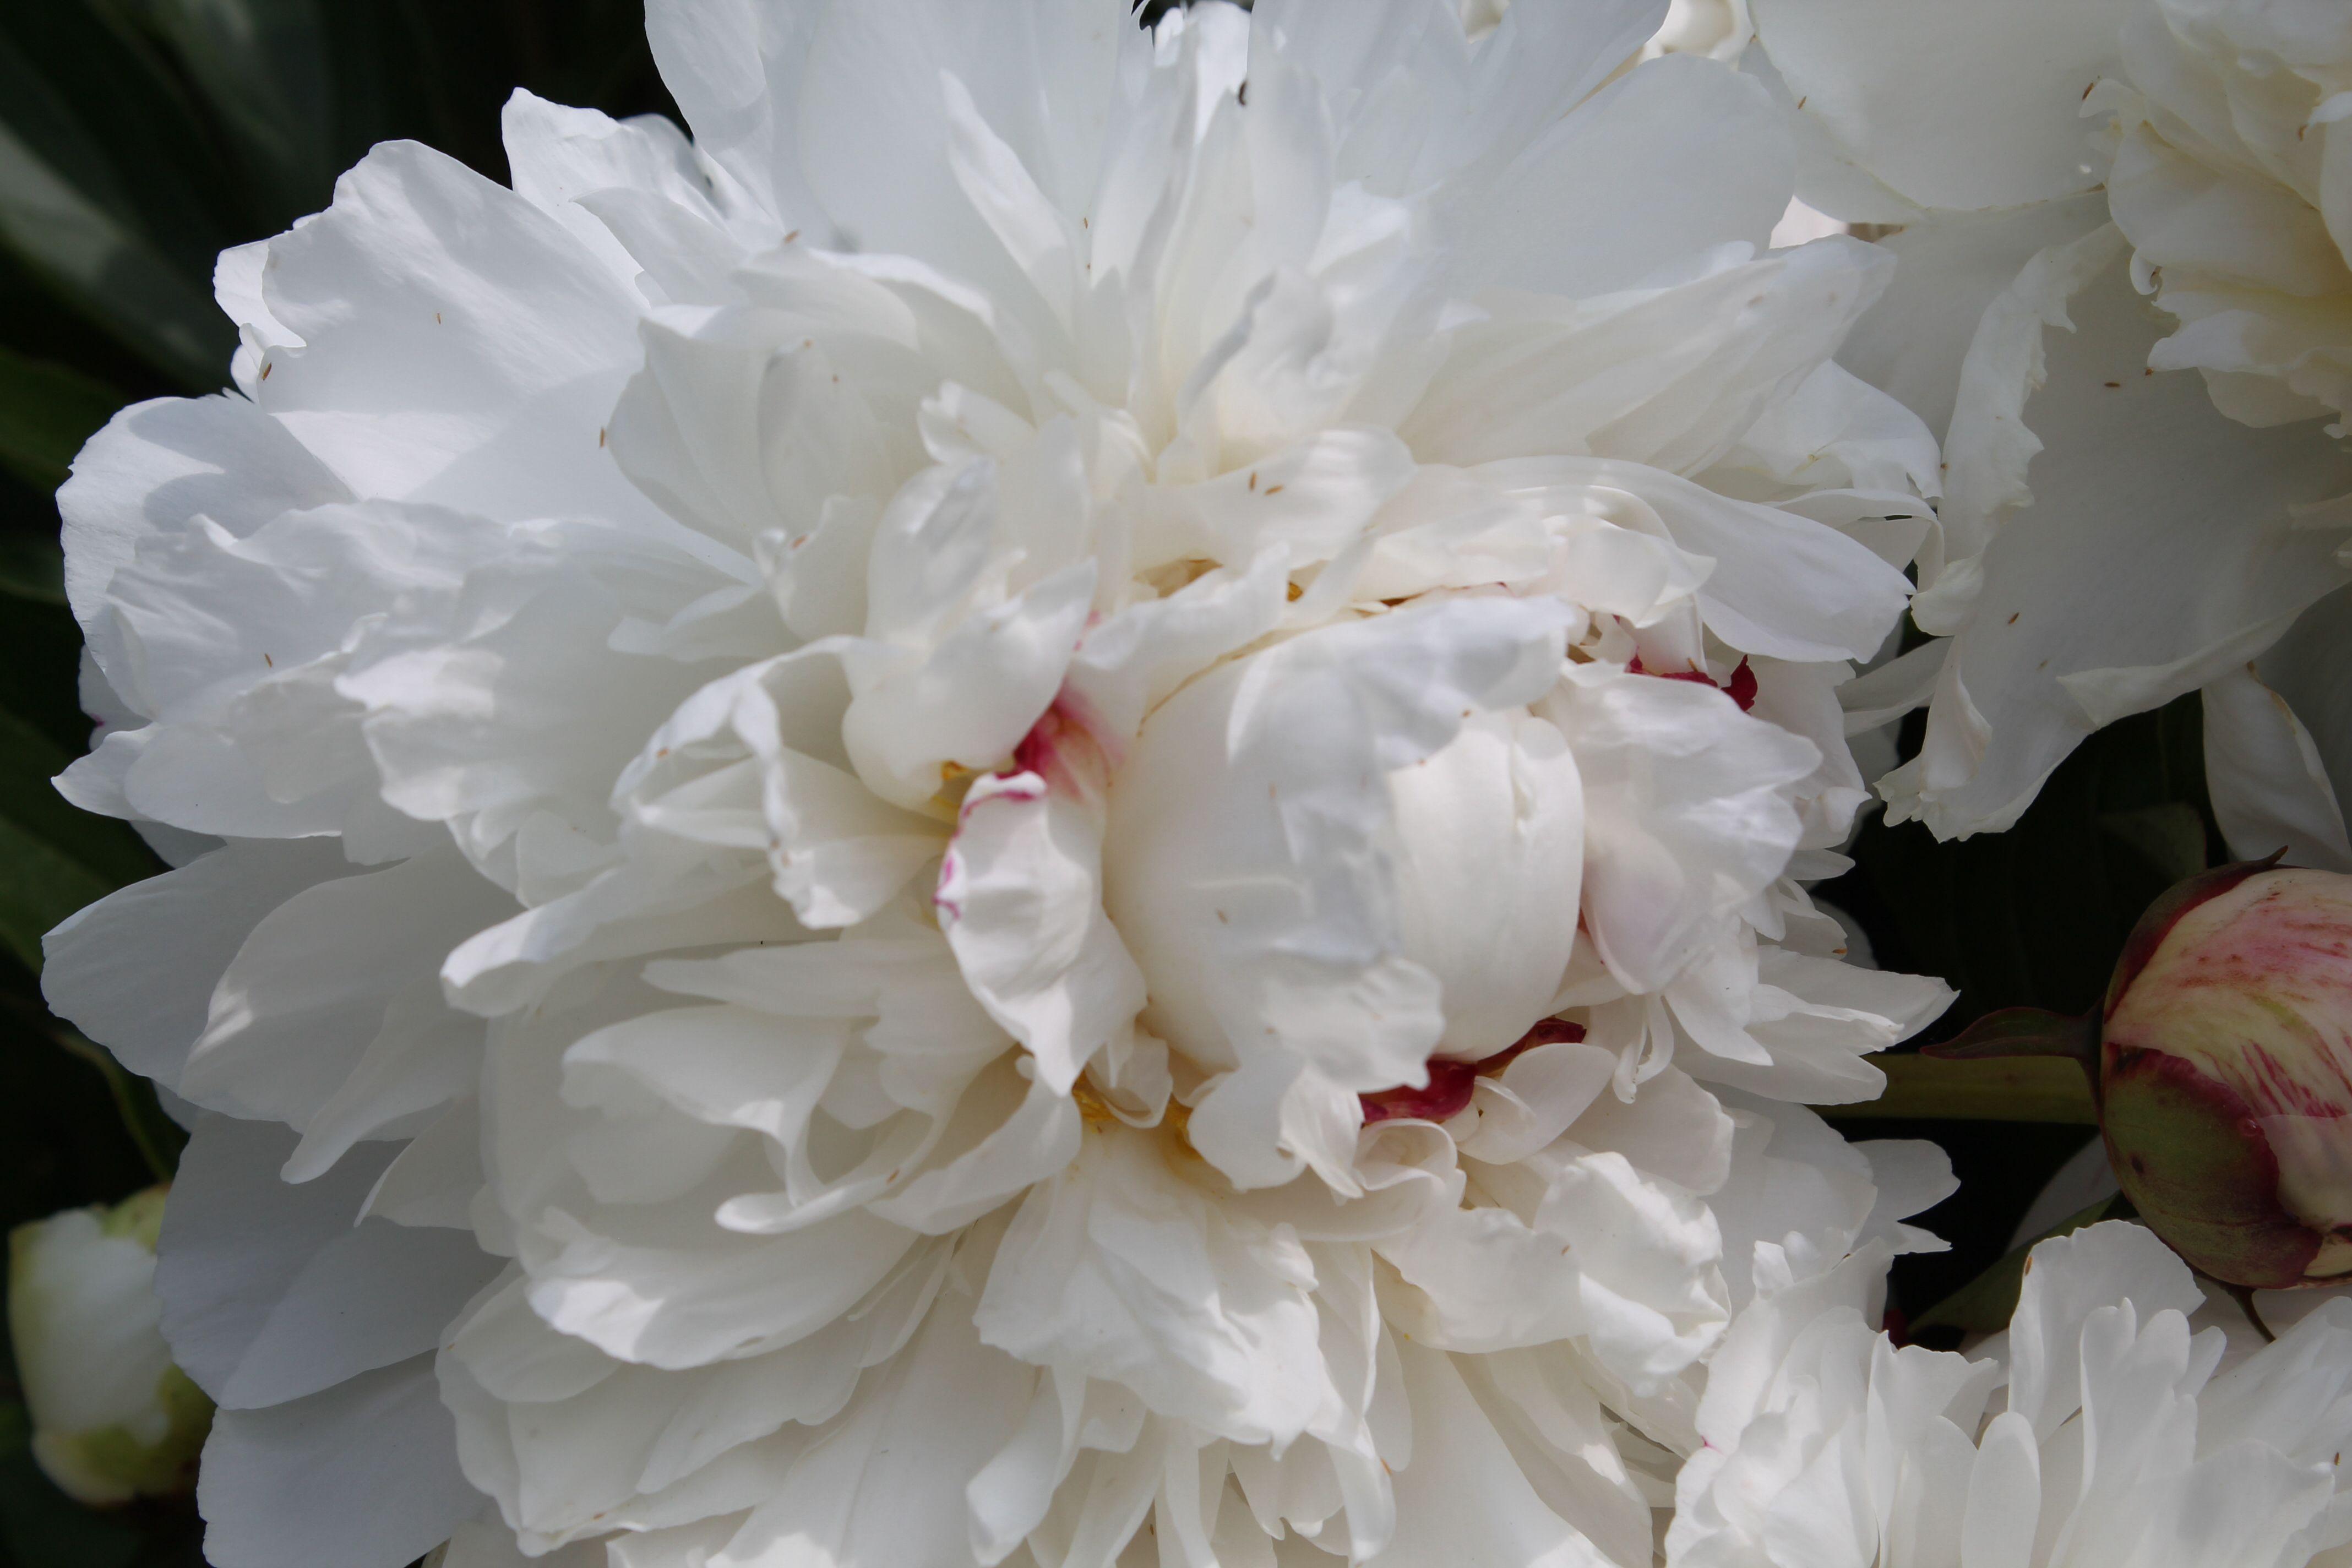 The peony. My favorite flower.